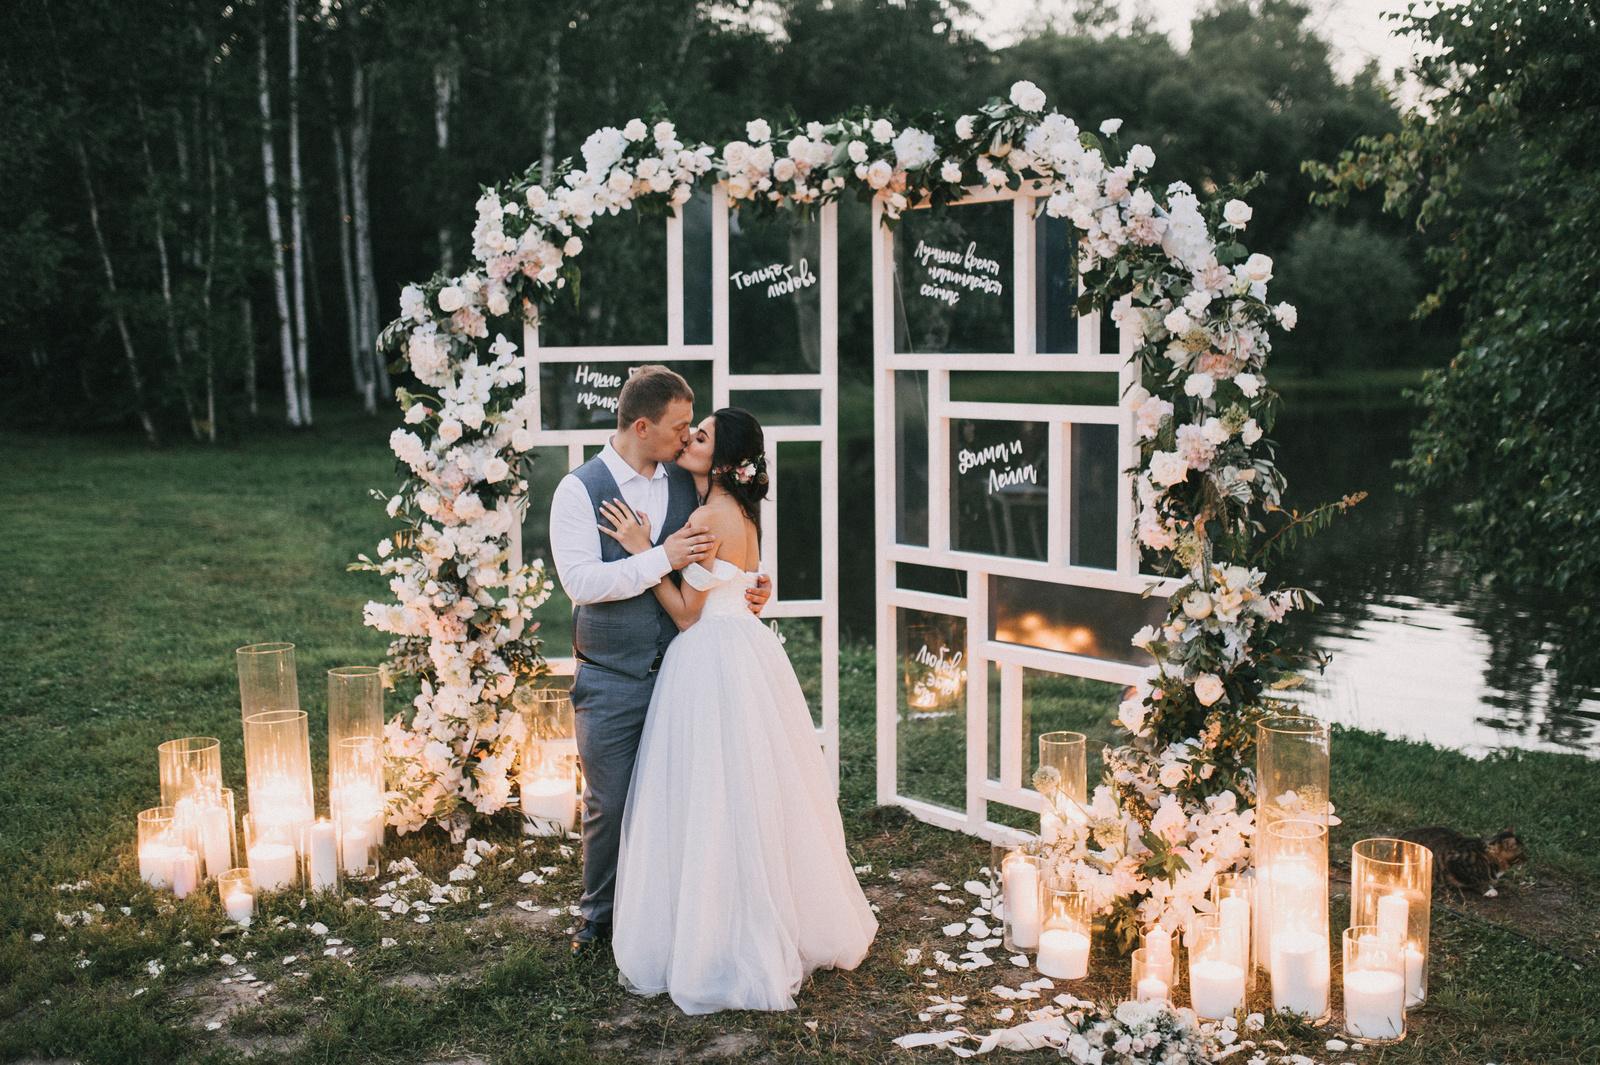 Happy Summer Day: романтичная свадьба за городом